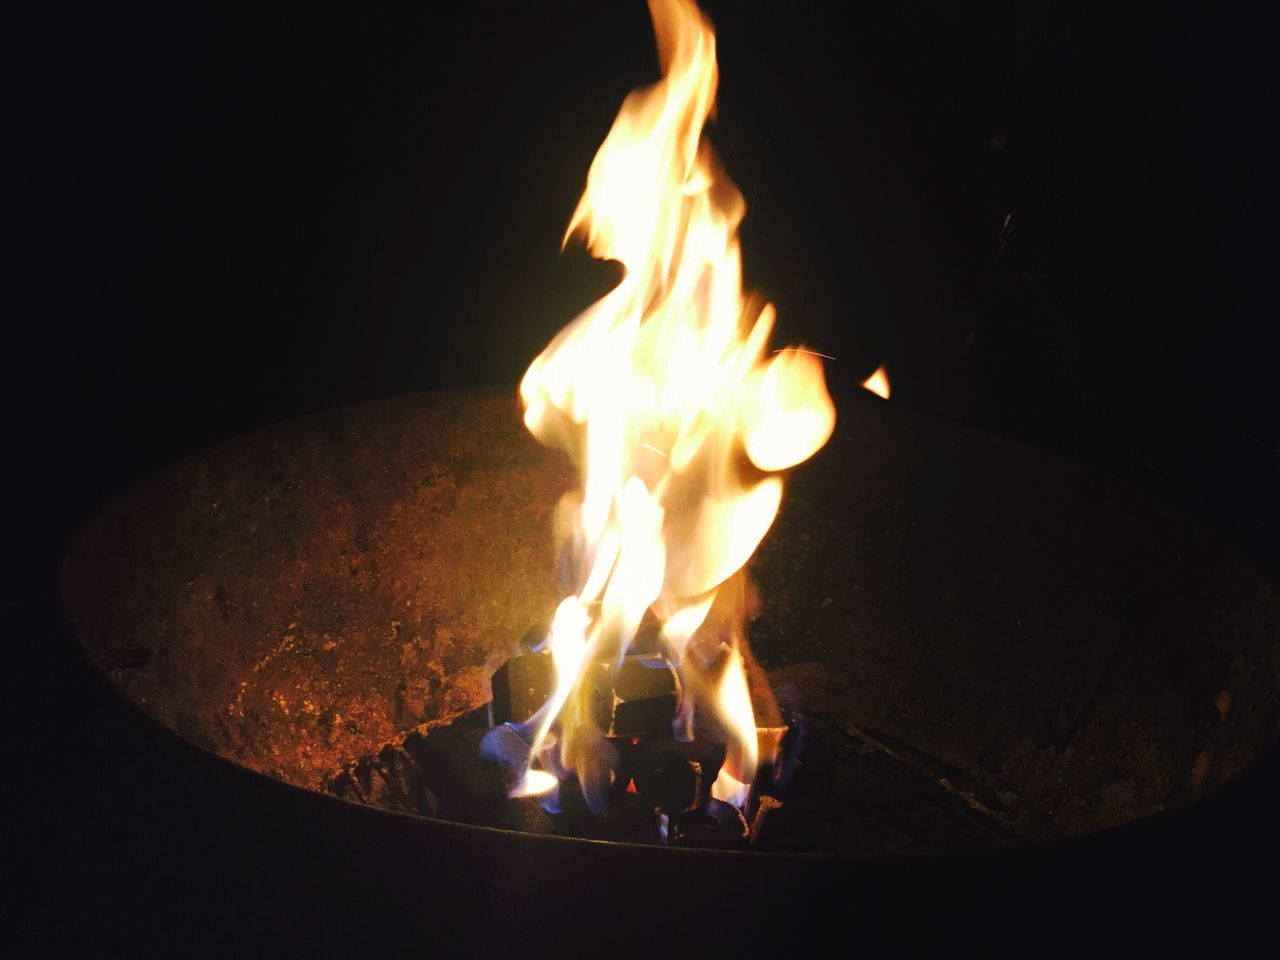 fire - natural phenomenon, flame, burning, heat - temperature, glowing, night, no people, close-up, illuminated, fire pit, bonfire, outdoors, diya - oil lamp